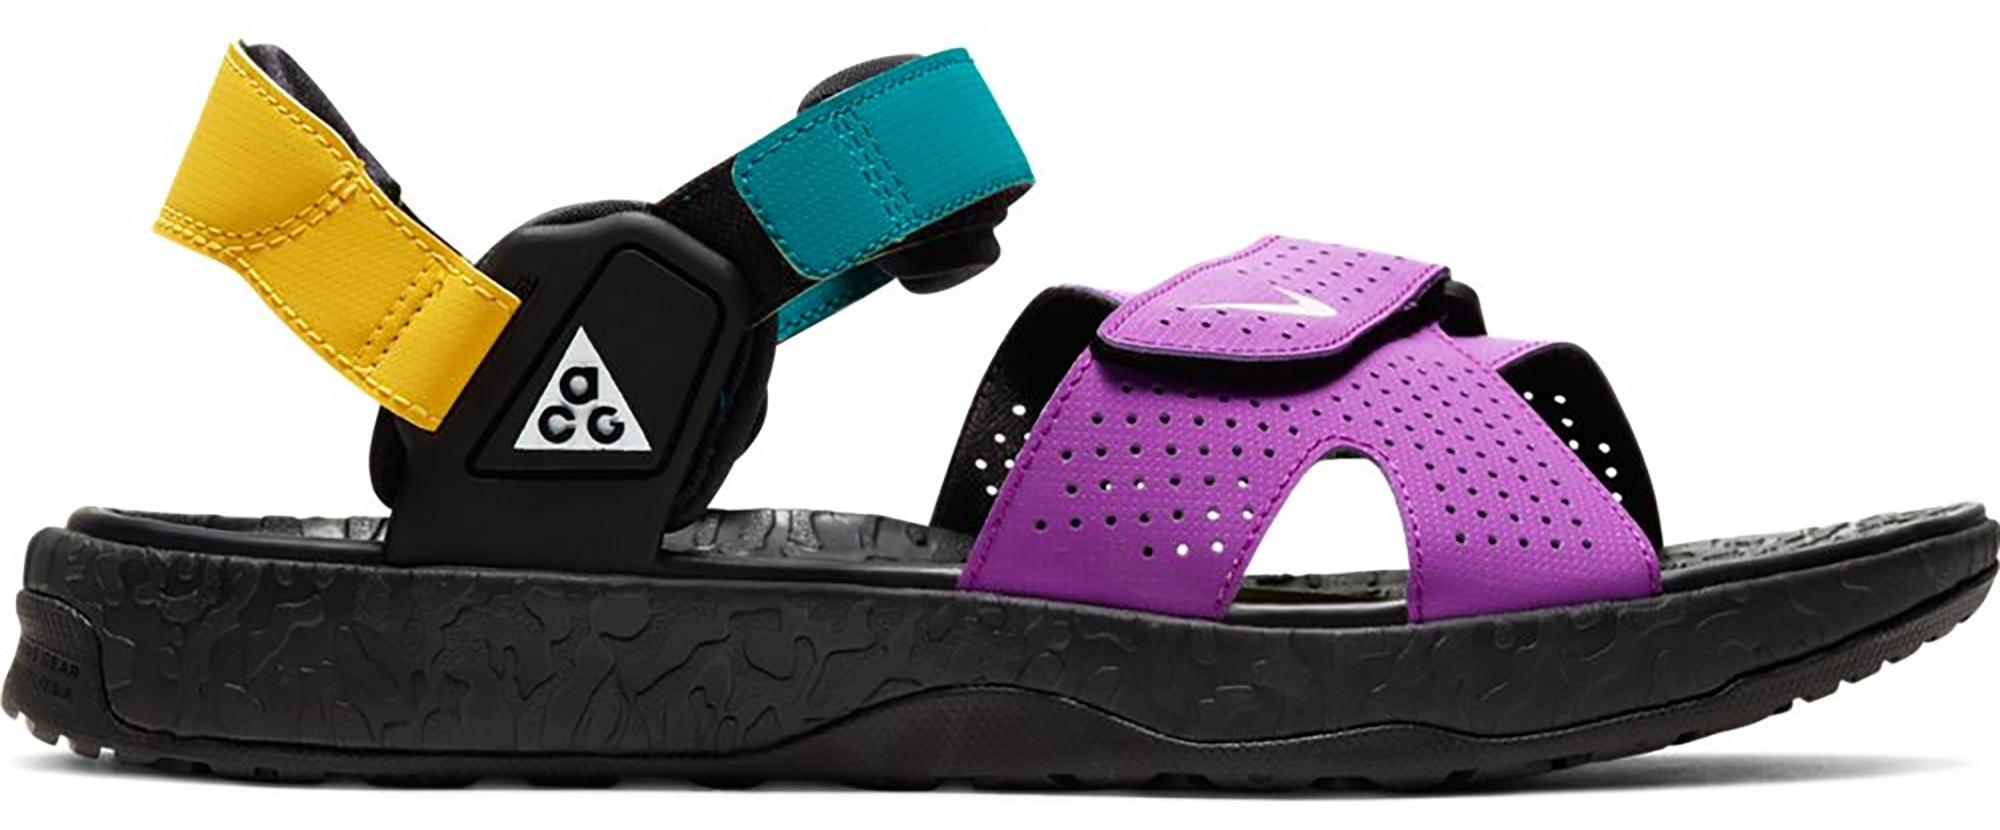 Nike ACG Air Deschutz Black Vivid